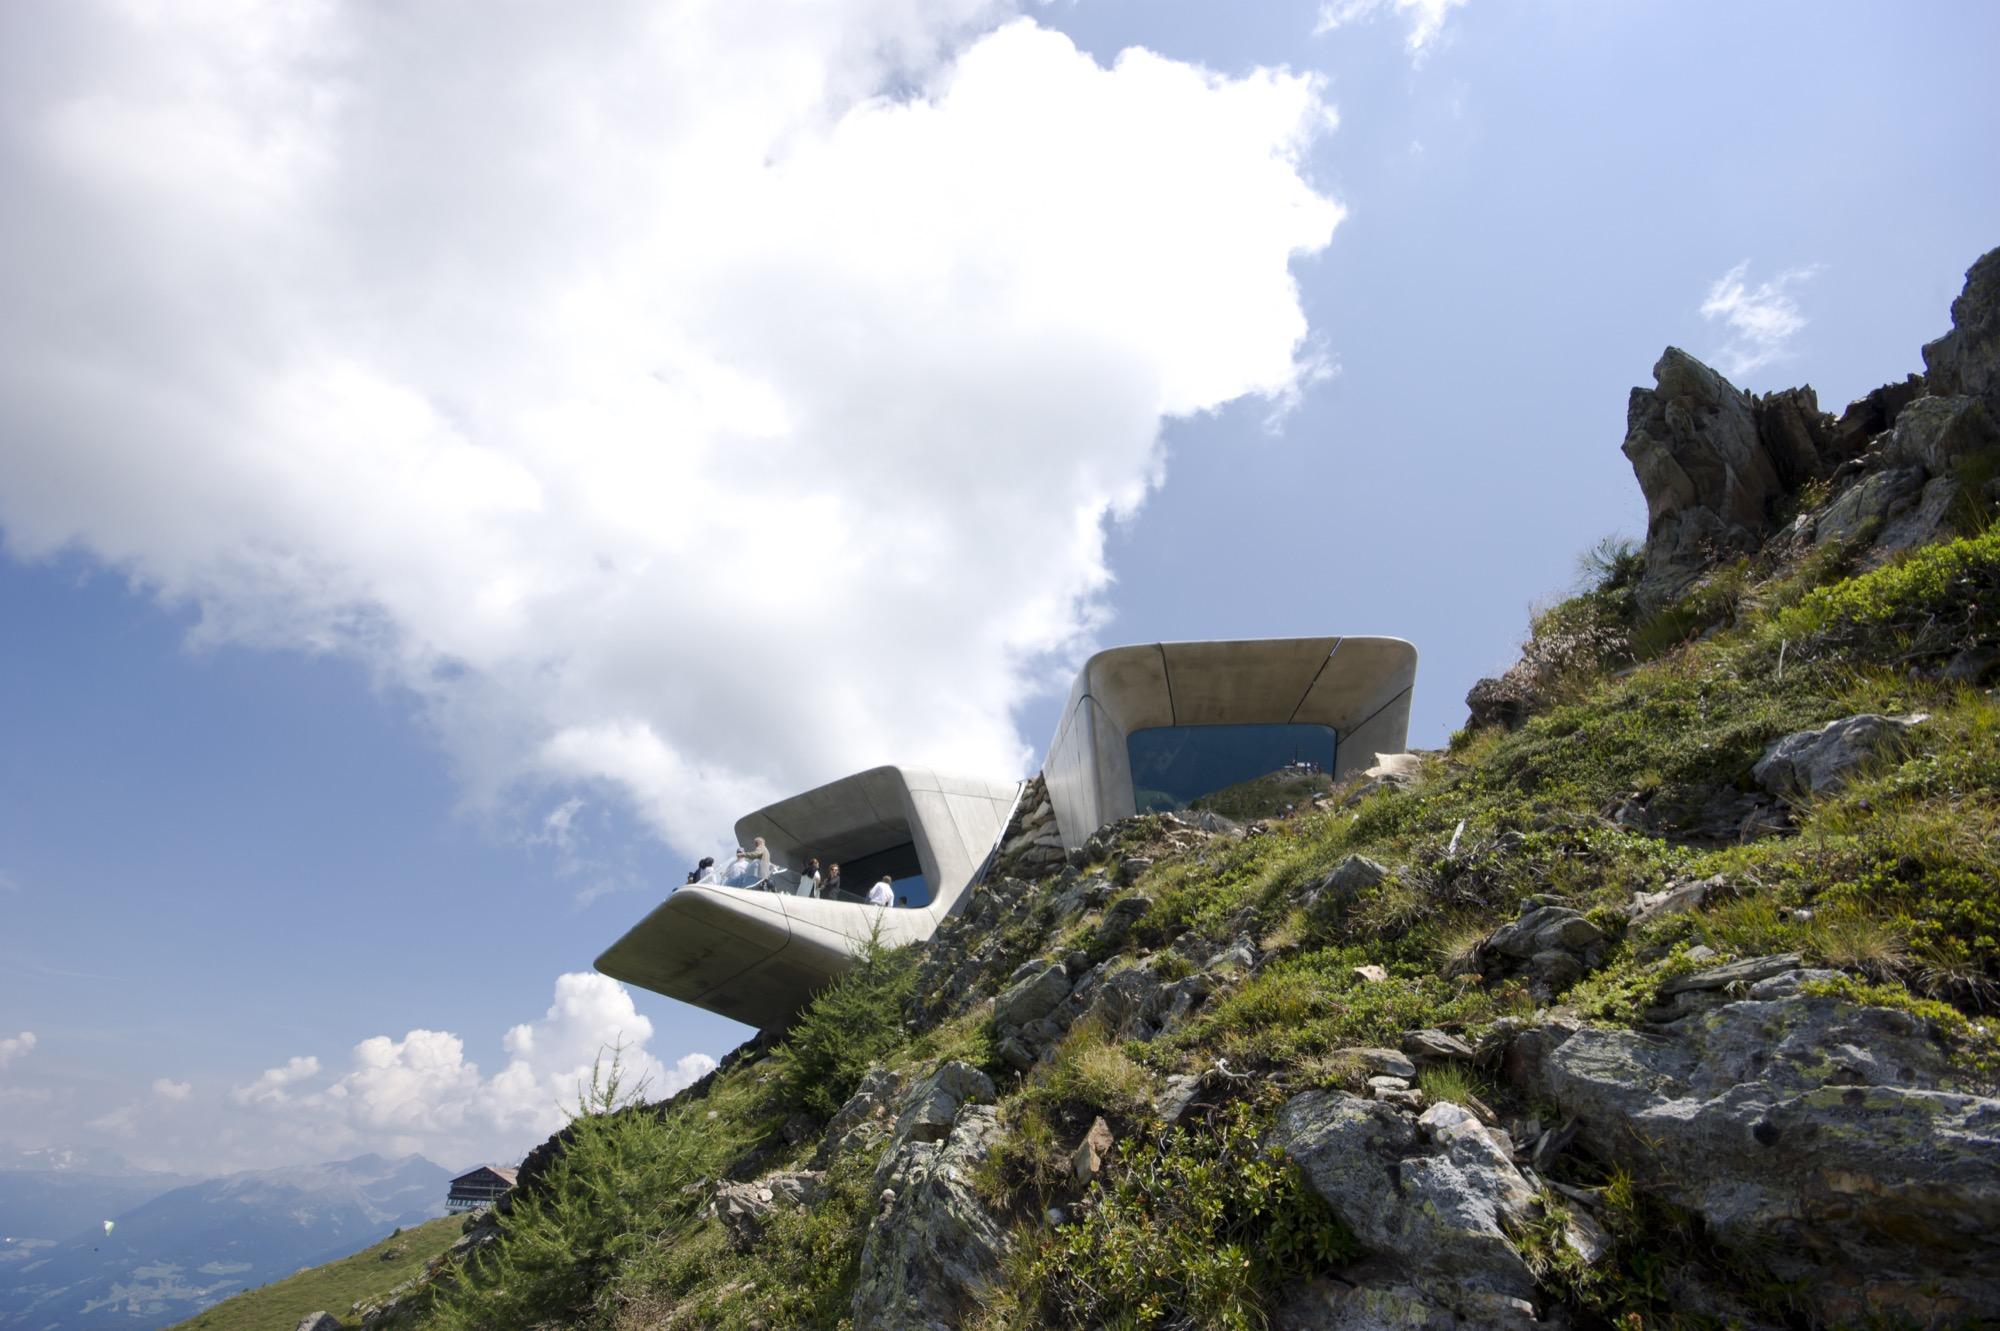 MMM Corones, Reinhold Messners mountain museum designed by Zaha Hadid